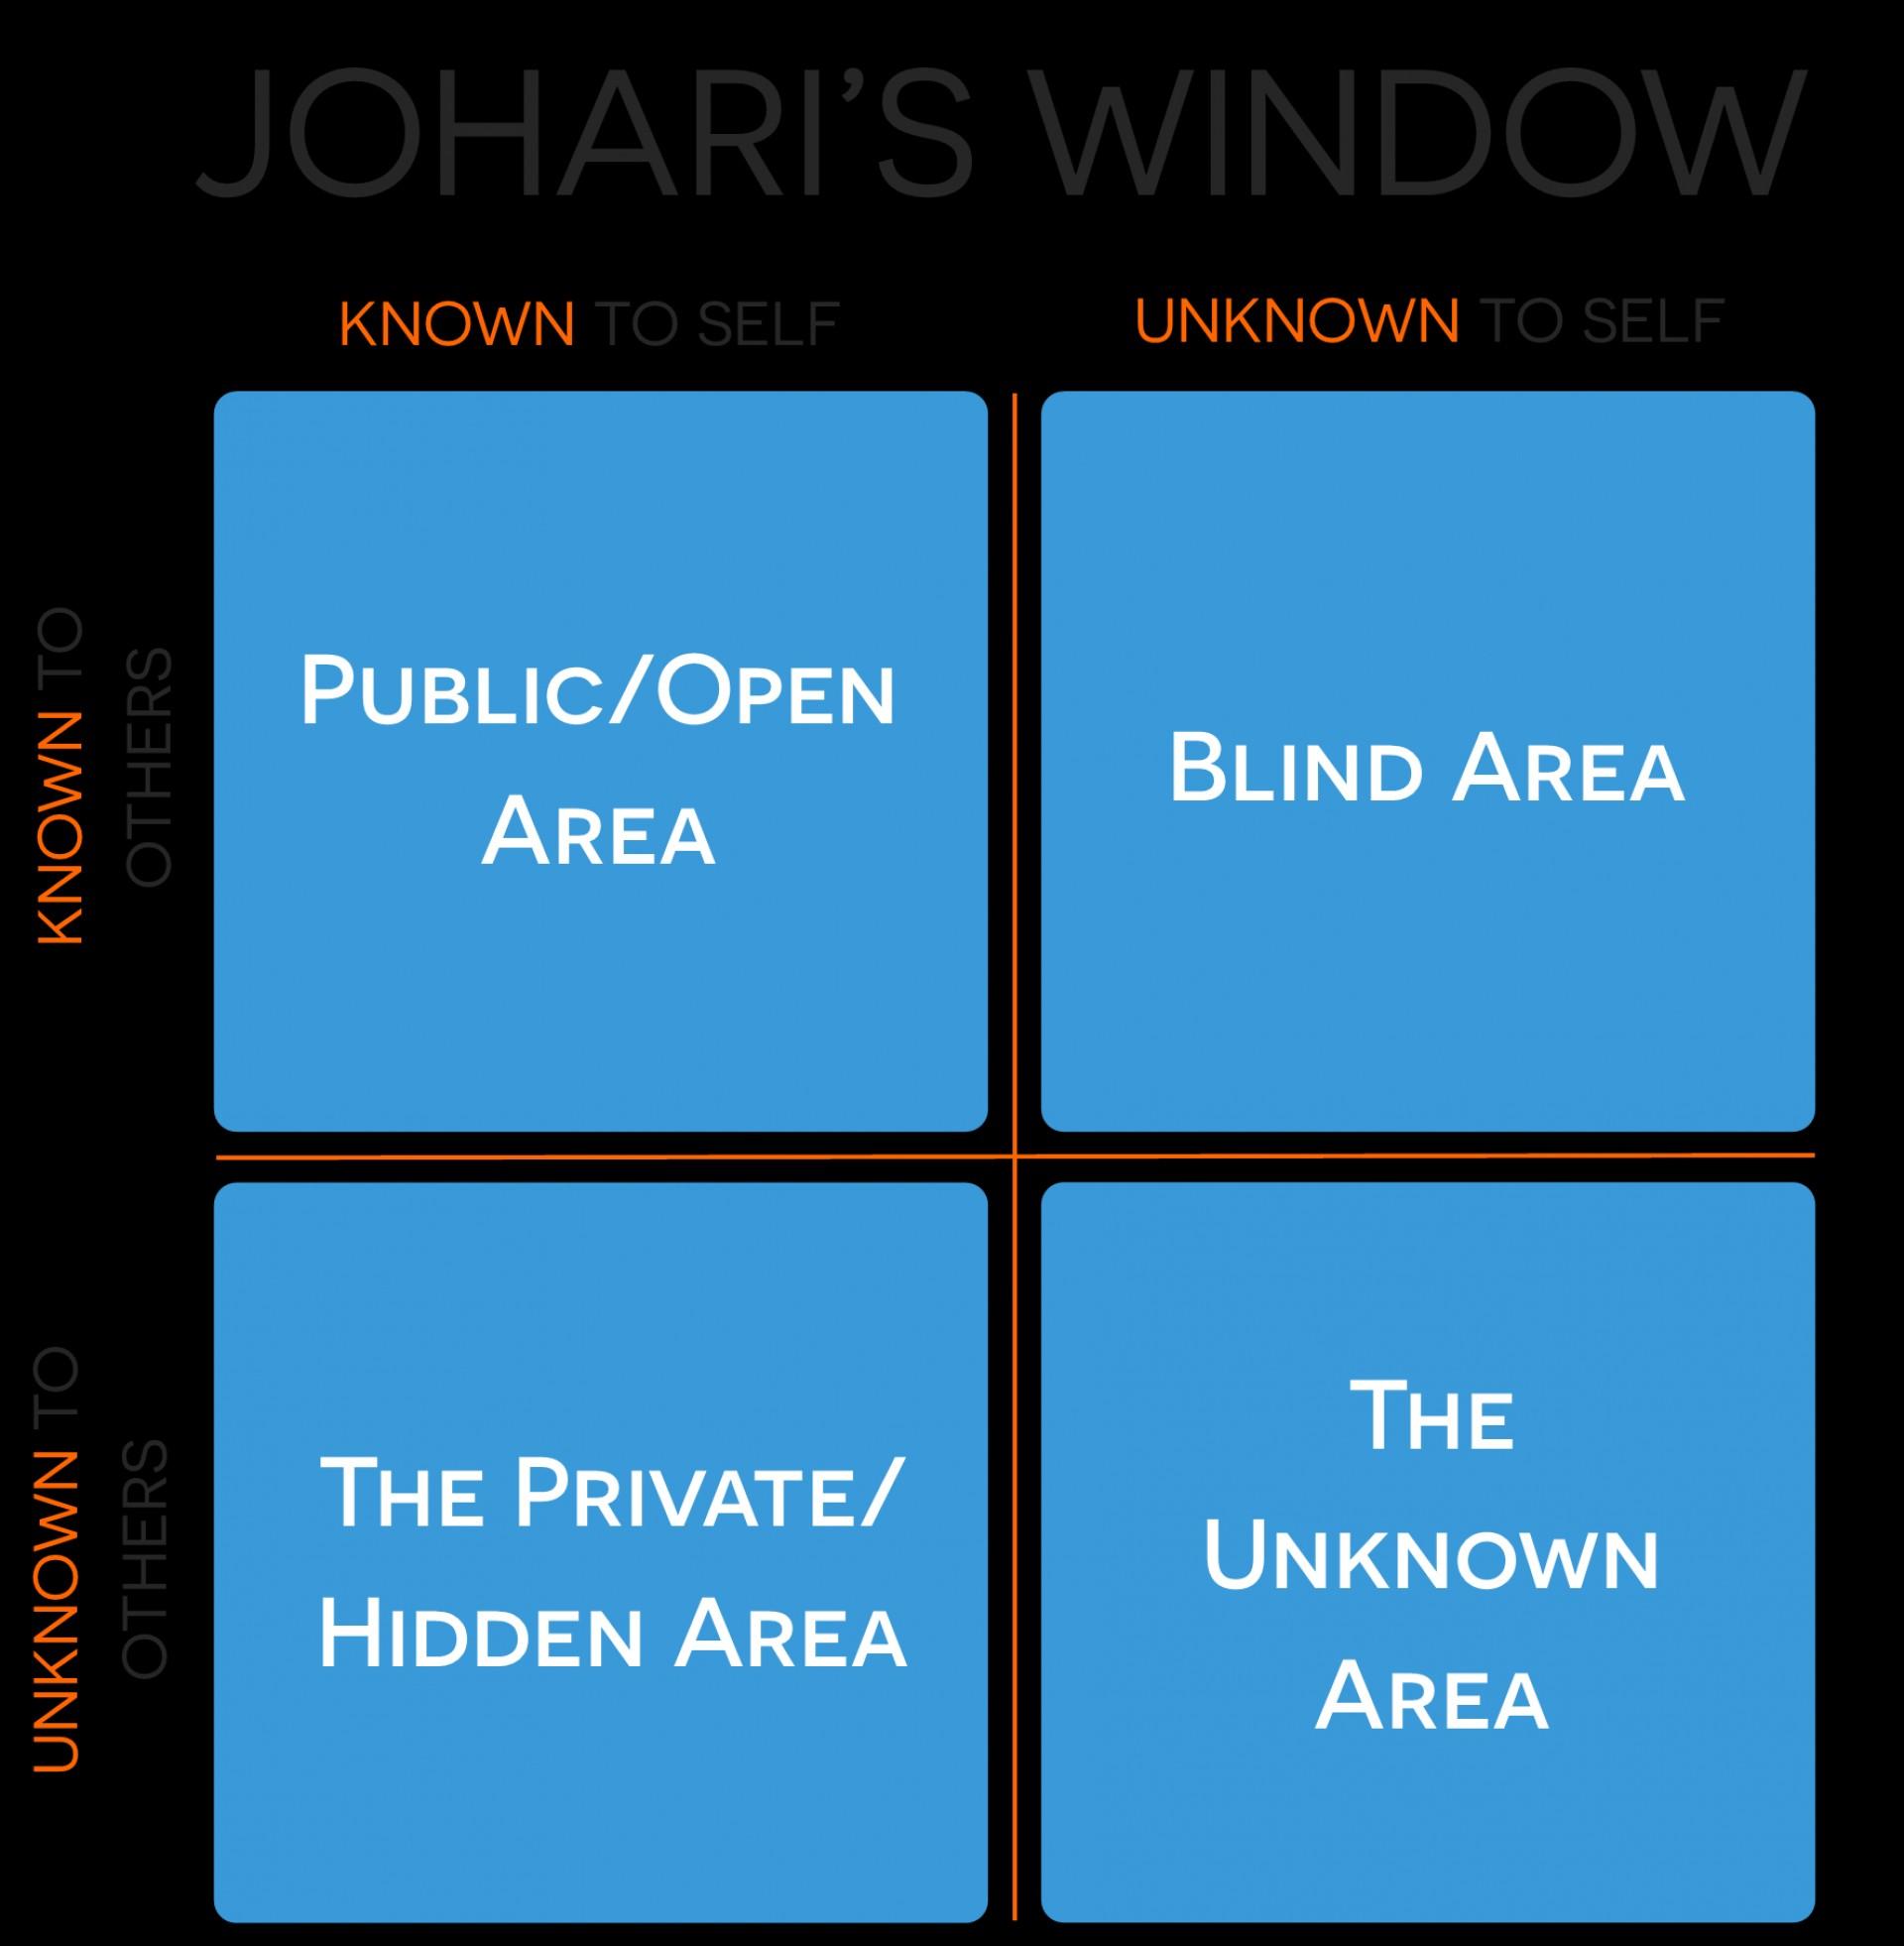 004 Johari Essay On Window Formidable Shopping Is Fun Windows 7 Operating System Short 1920